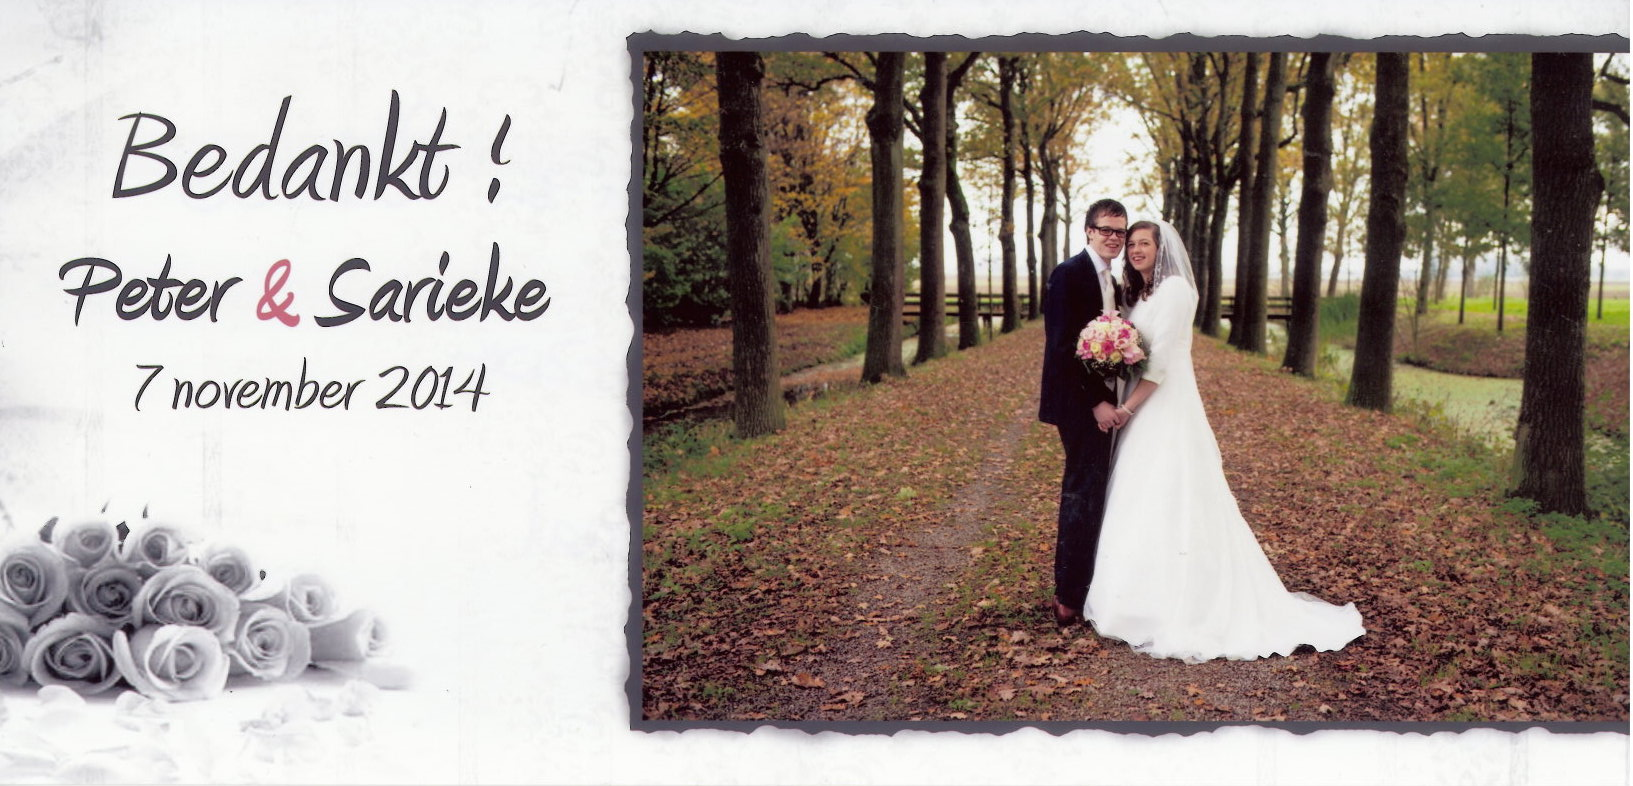 Bruidspaar Peter Muilwijk - Sarieke Lobbezoo (07-11-2014)